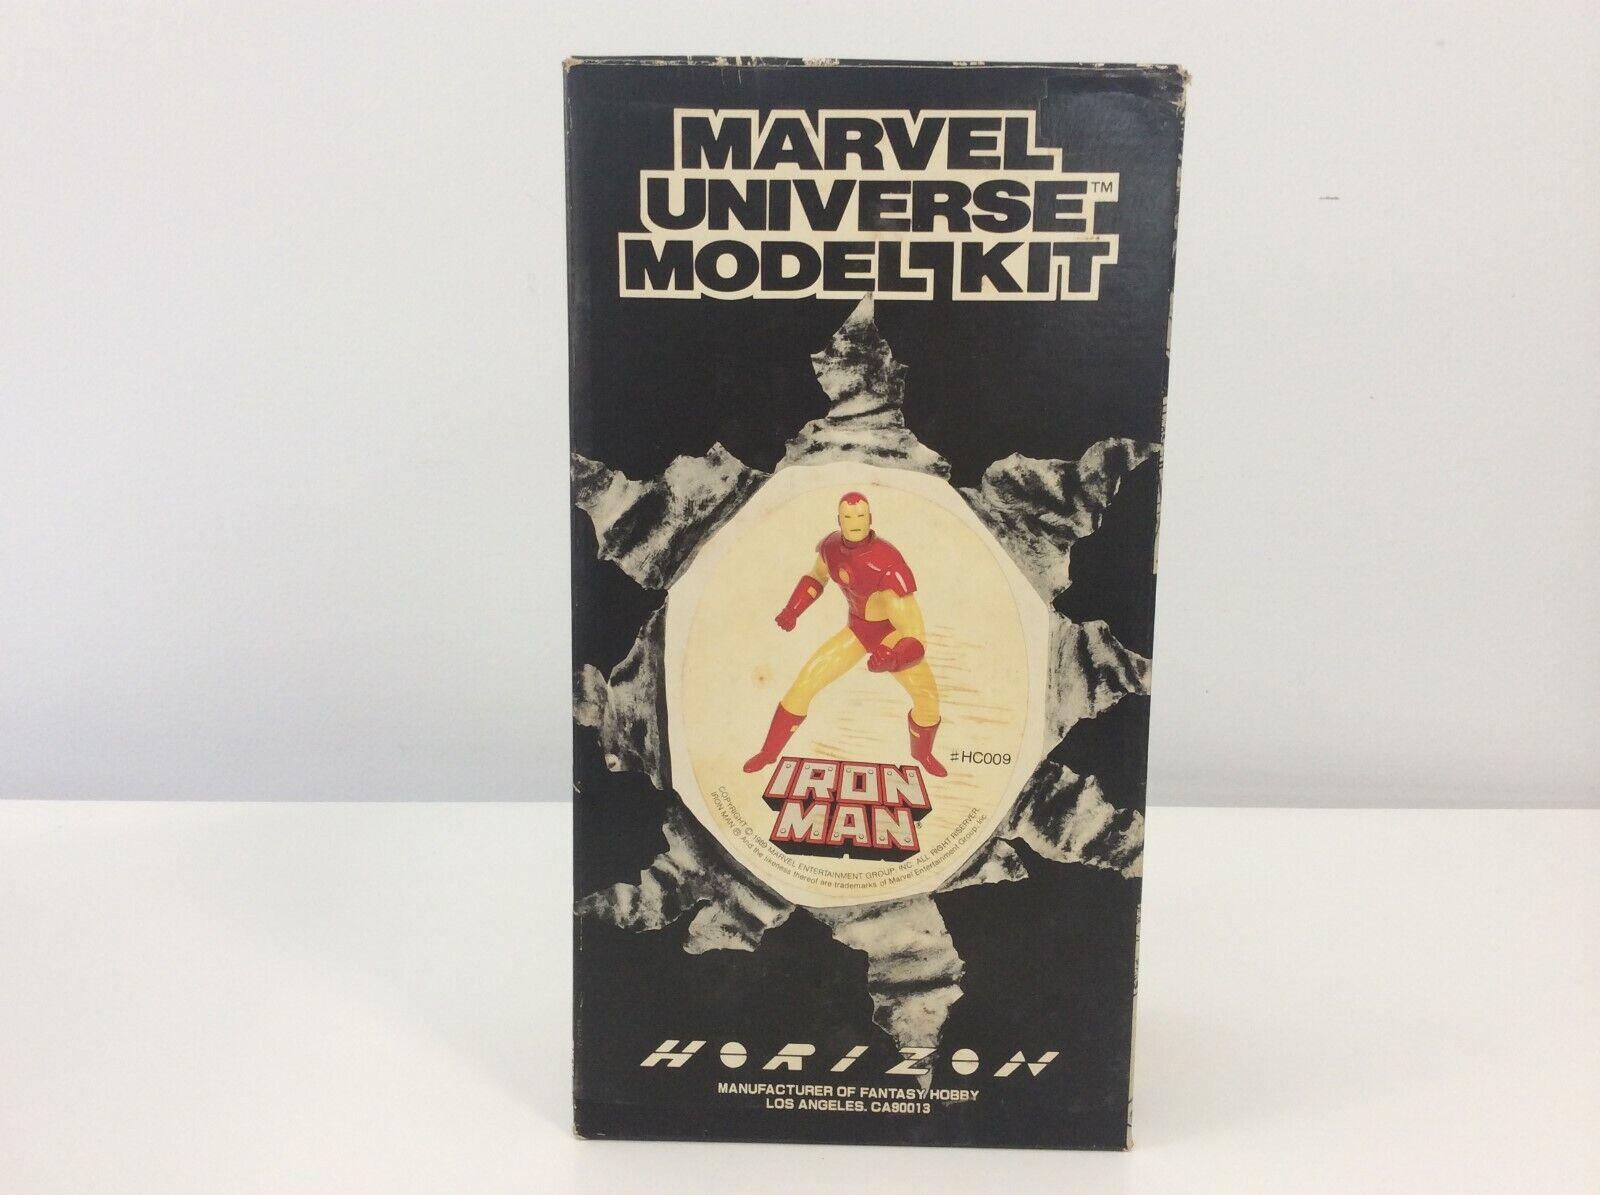 Vintage 1989 Marvel Universe Model Kit - Iron Man - MISB C009